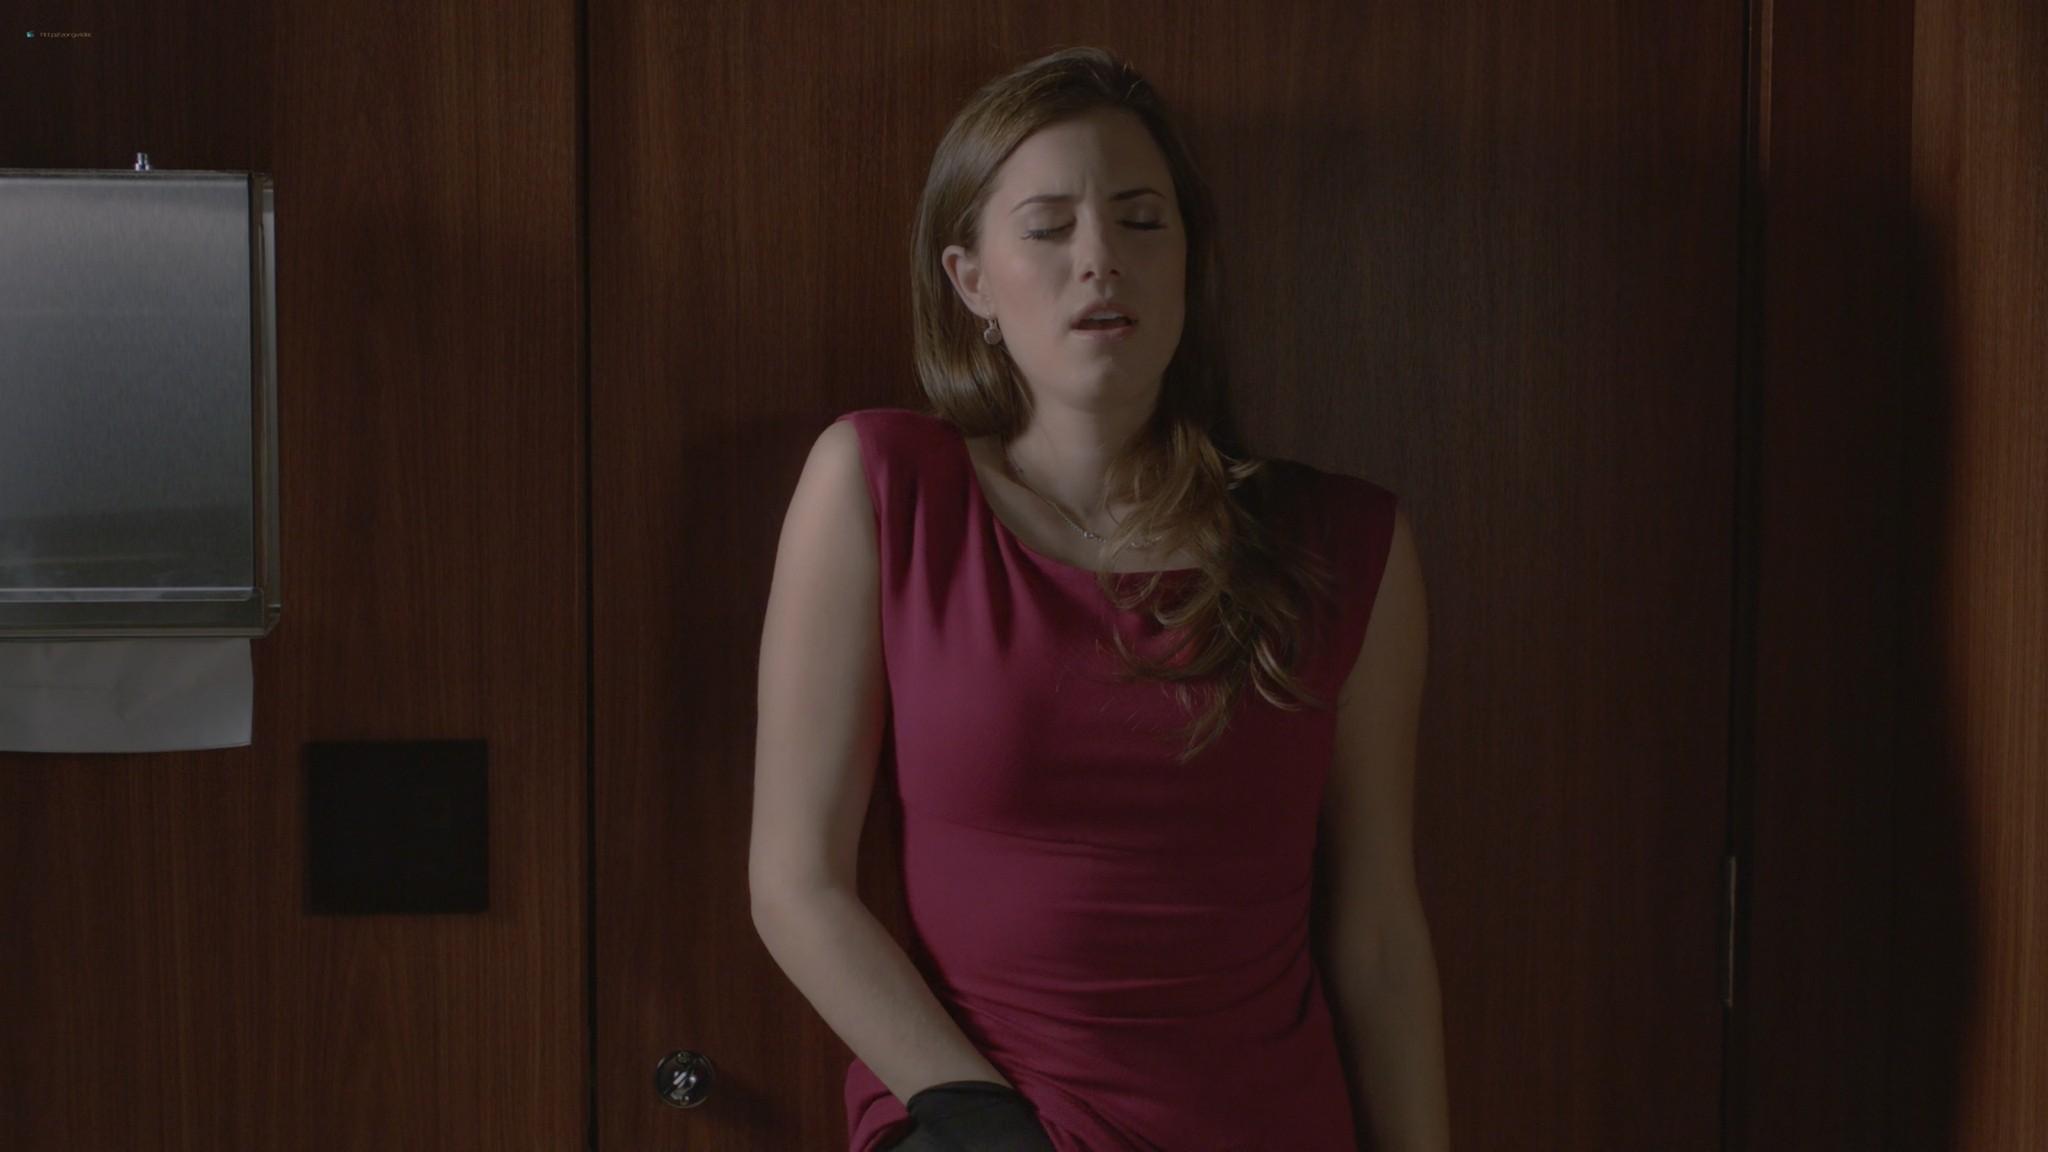 Allison Williams sex Lena Dunham nude Zosia Mamet Jemima Kirke sex Girls 2012 s1e3 5 1080p Web